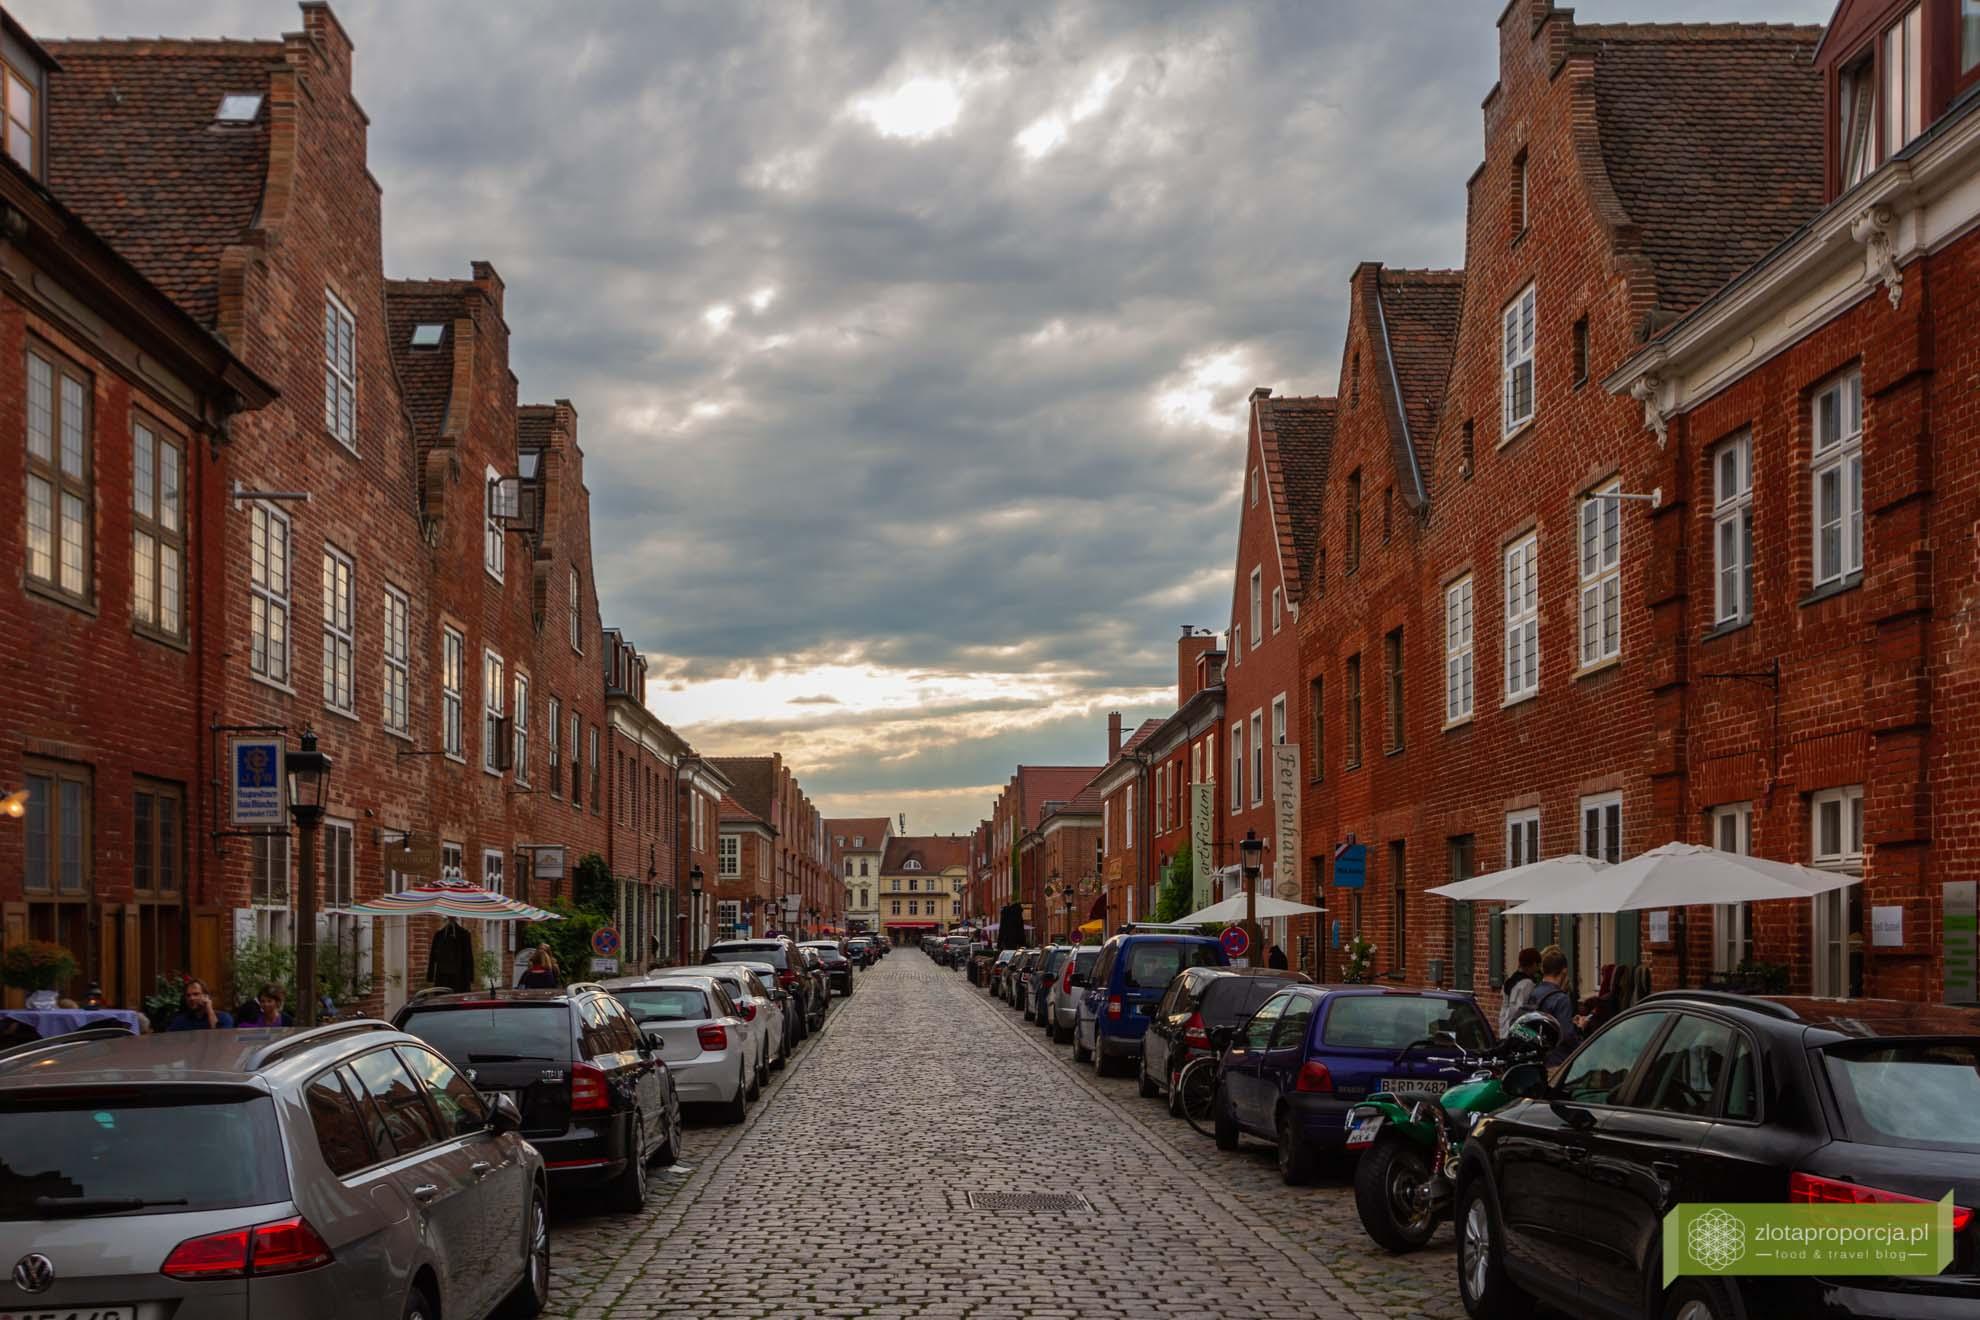 Poczdam, atrakcje Poczdamu, Brandenburgia, atrakcje Brandenburgii; dzielnica holenderska; dzielnica holenderska Poczdam;